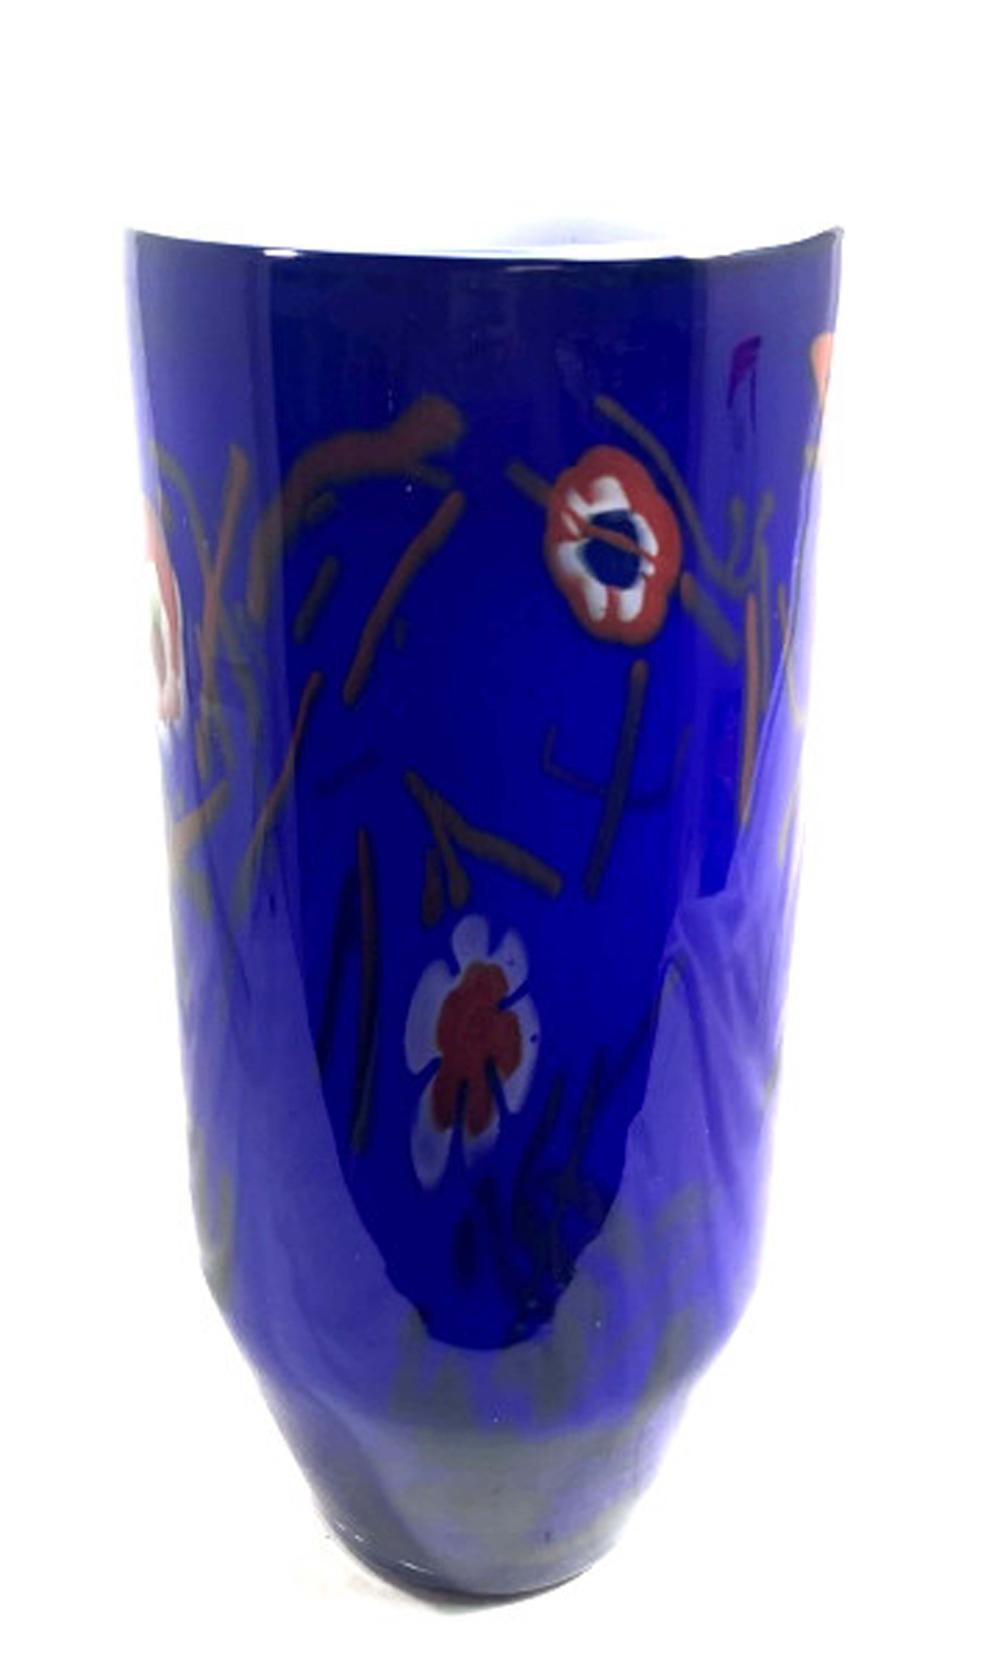 Lot 50: SPLENDID TALL MURANO COBALT MILIFIORI GLASS VASE